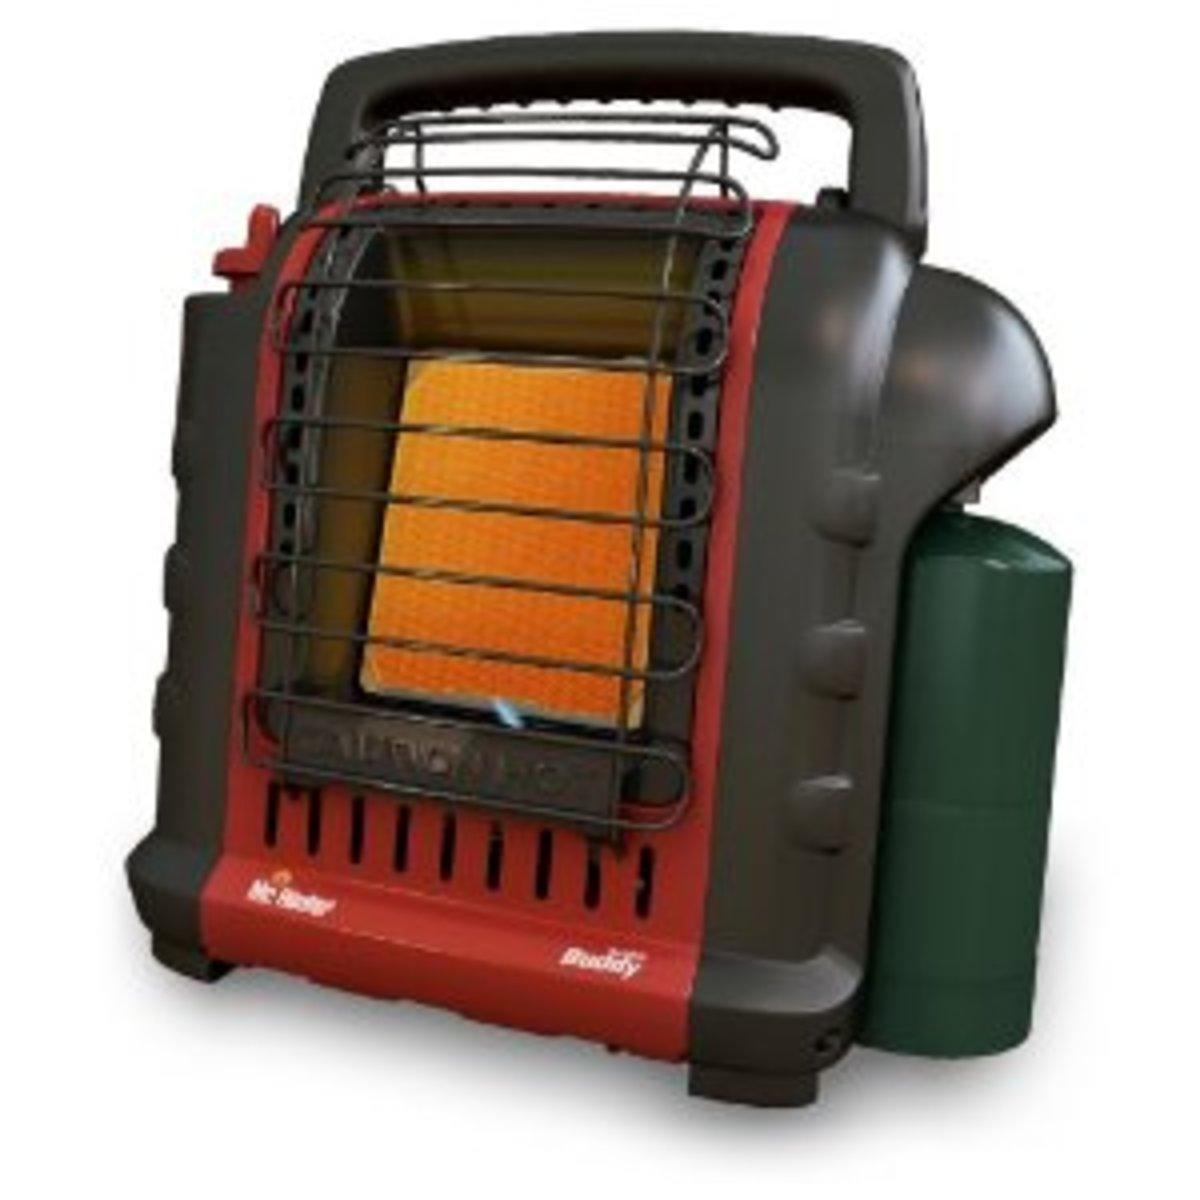 Mr. Heater F232000 MH9BX Buddy 4,000-9,000-BTU Indoor-Safe Portable Radiant Heater